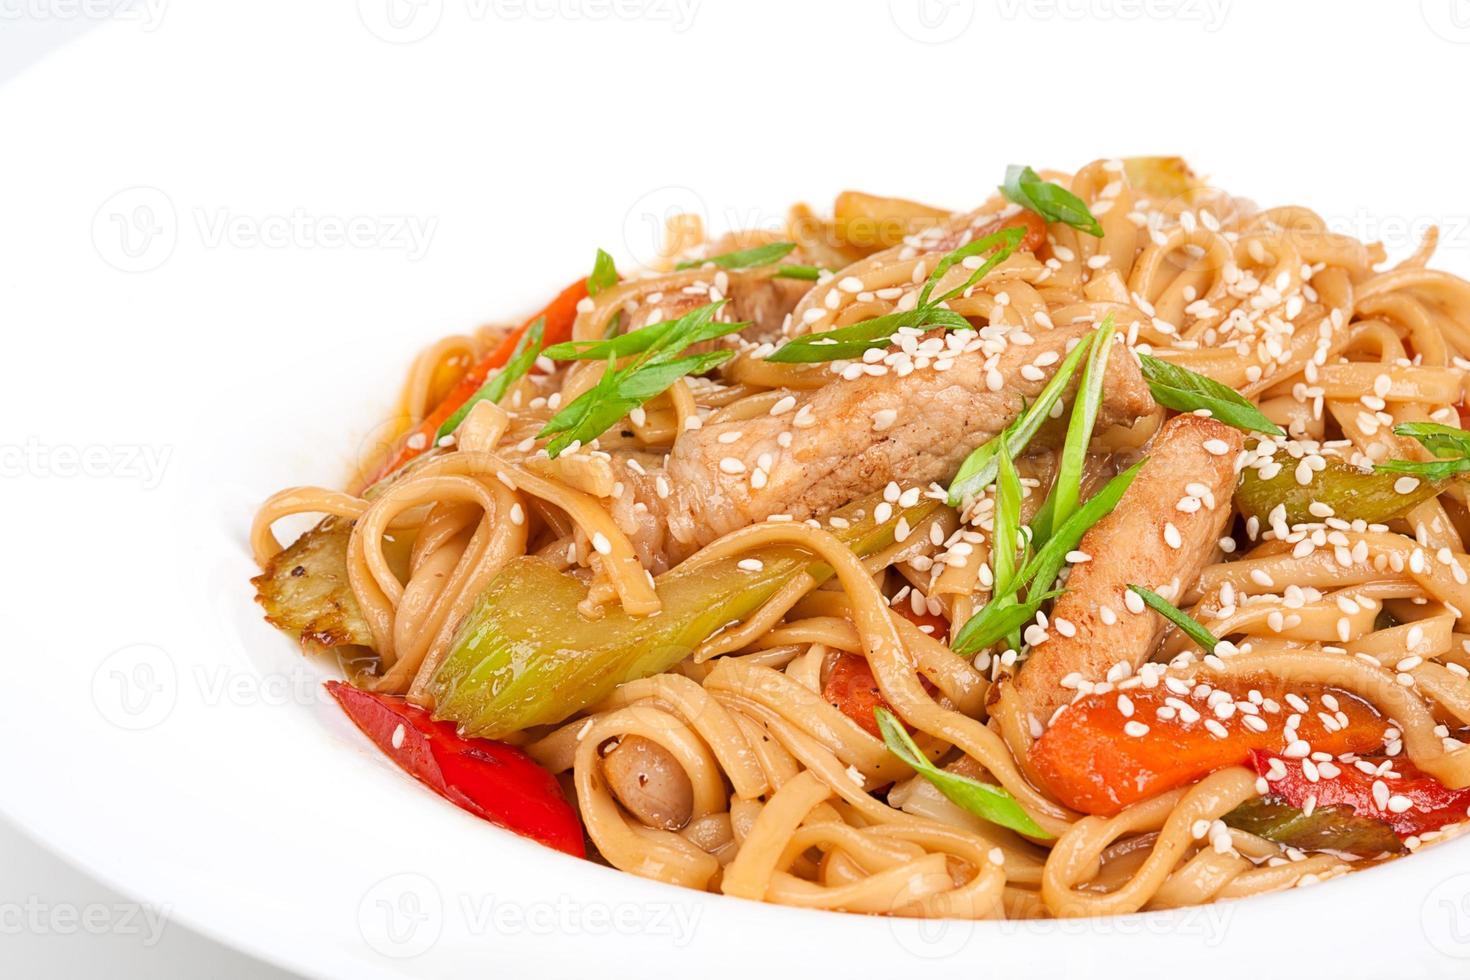 a agulha de udon com carne de porco e legumes foto